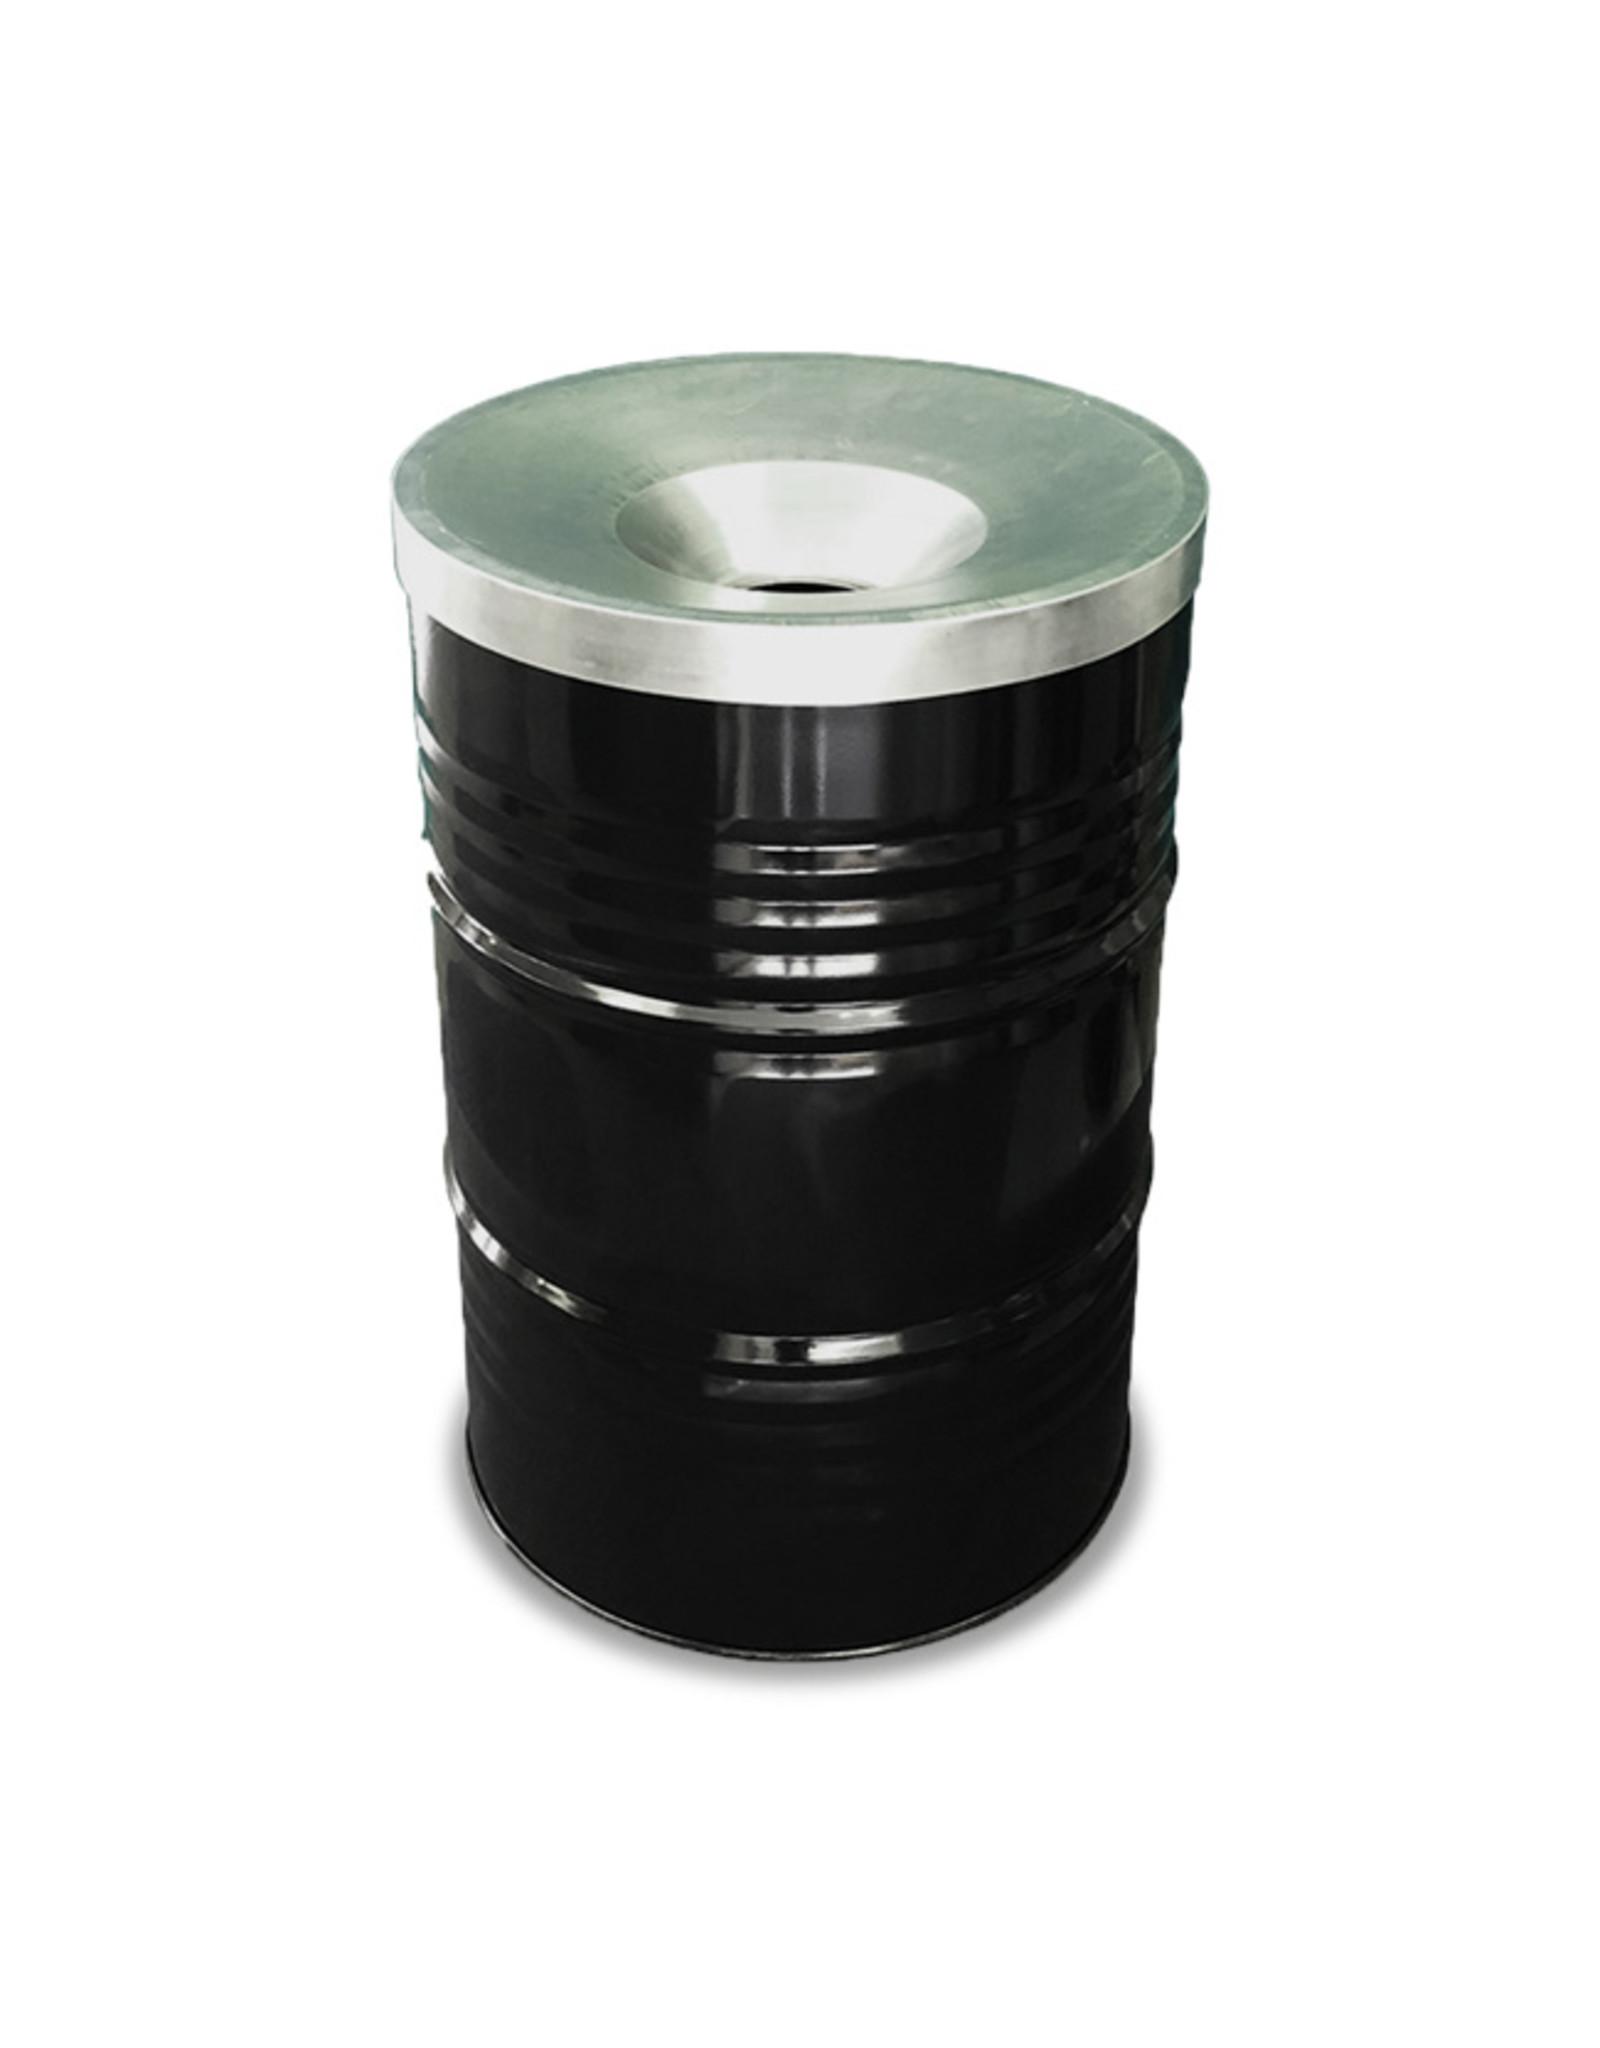 The Binbin Flame-retardant lid for a 200L drum-Bin